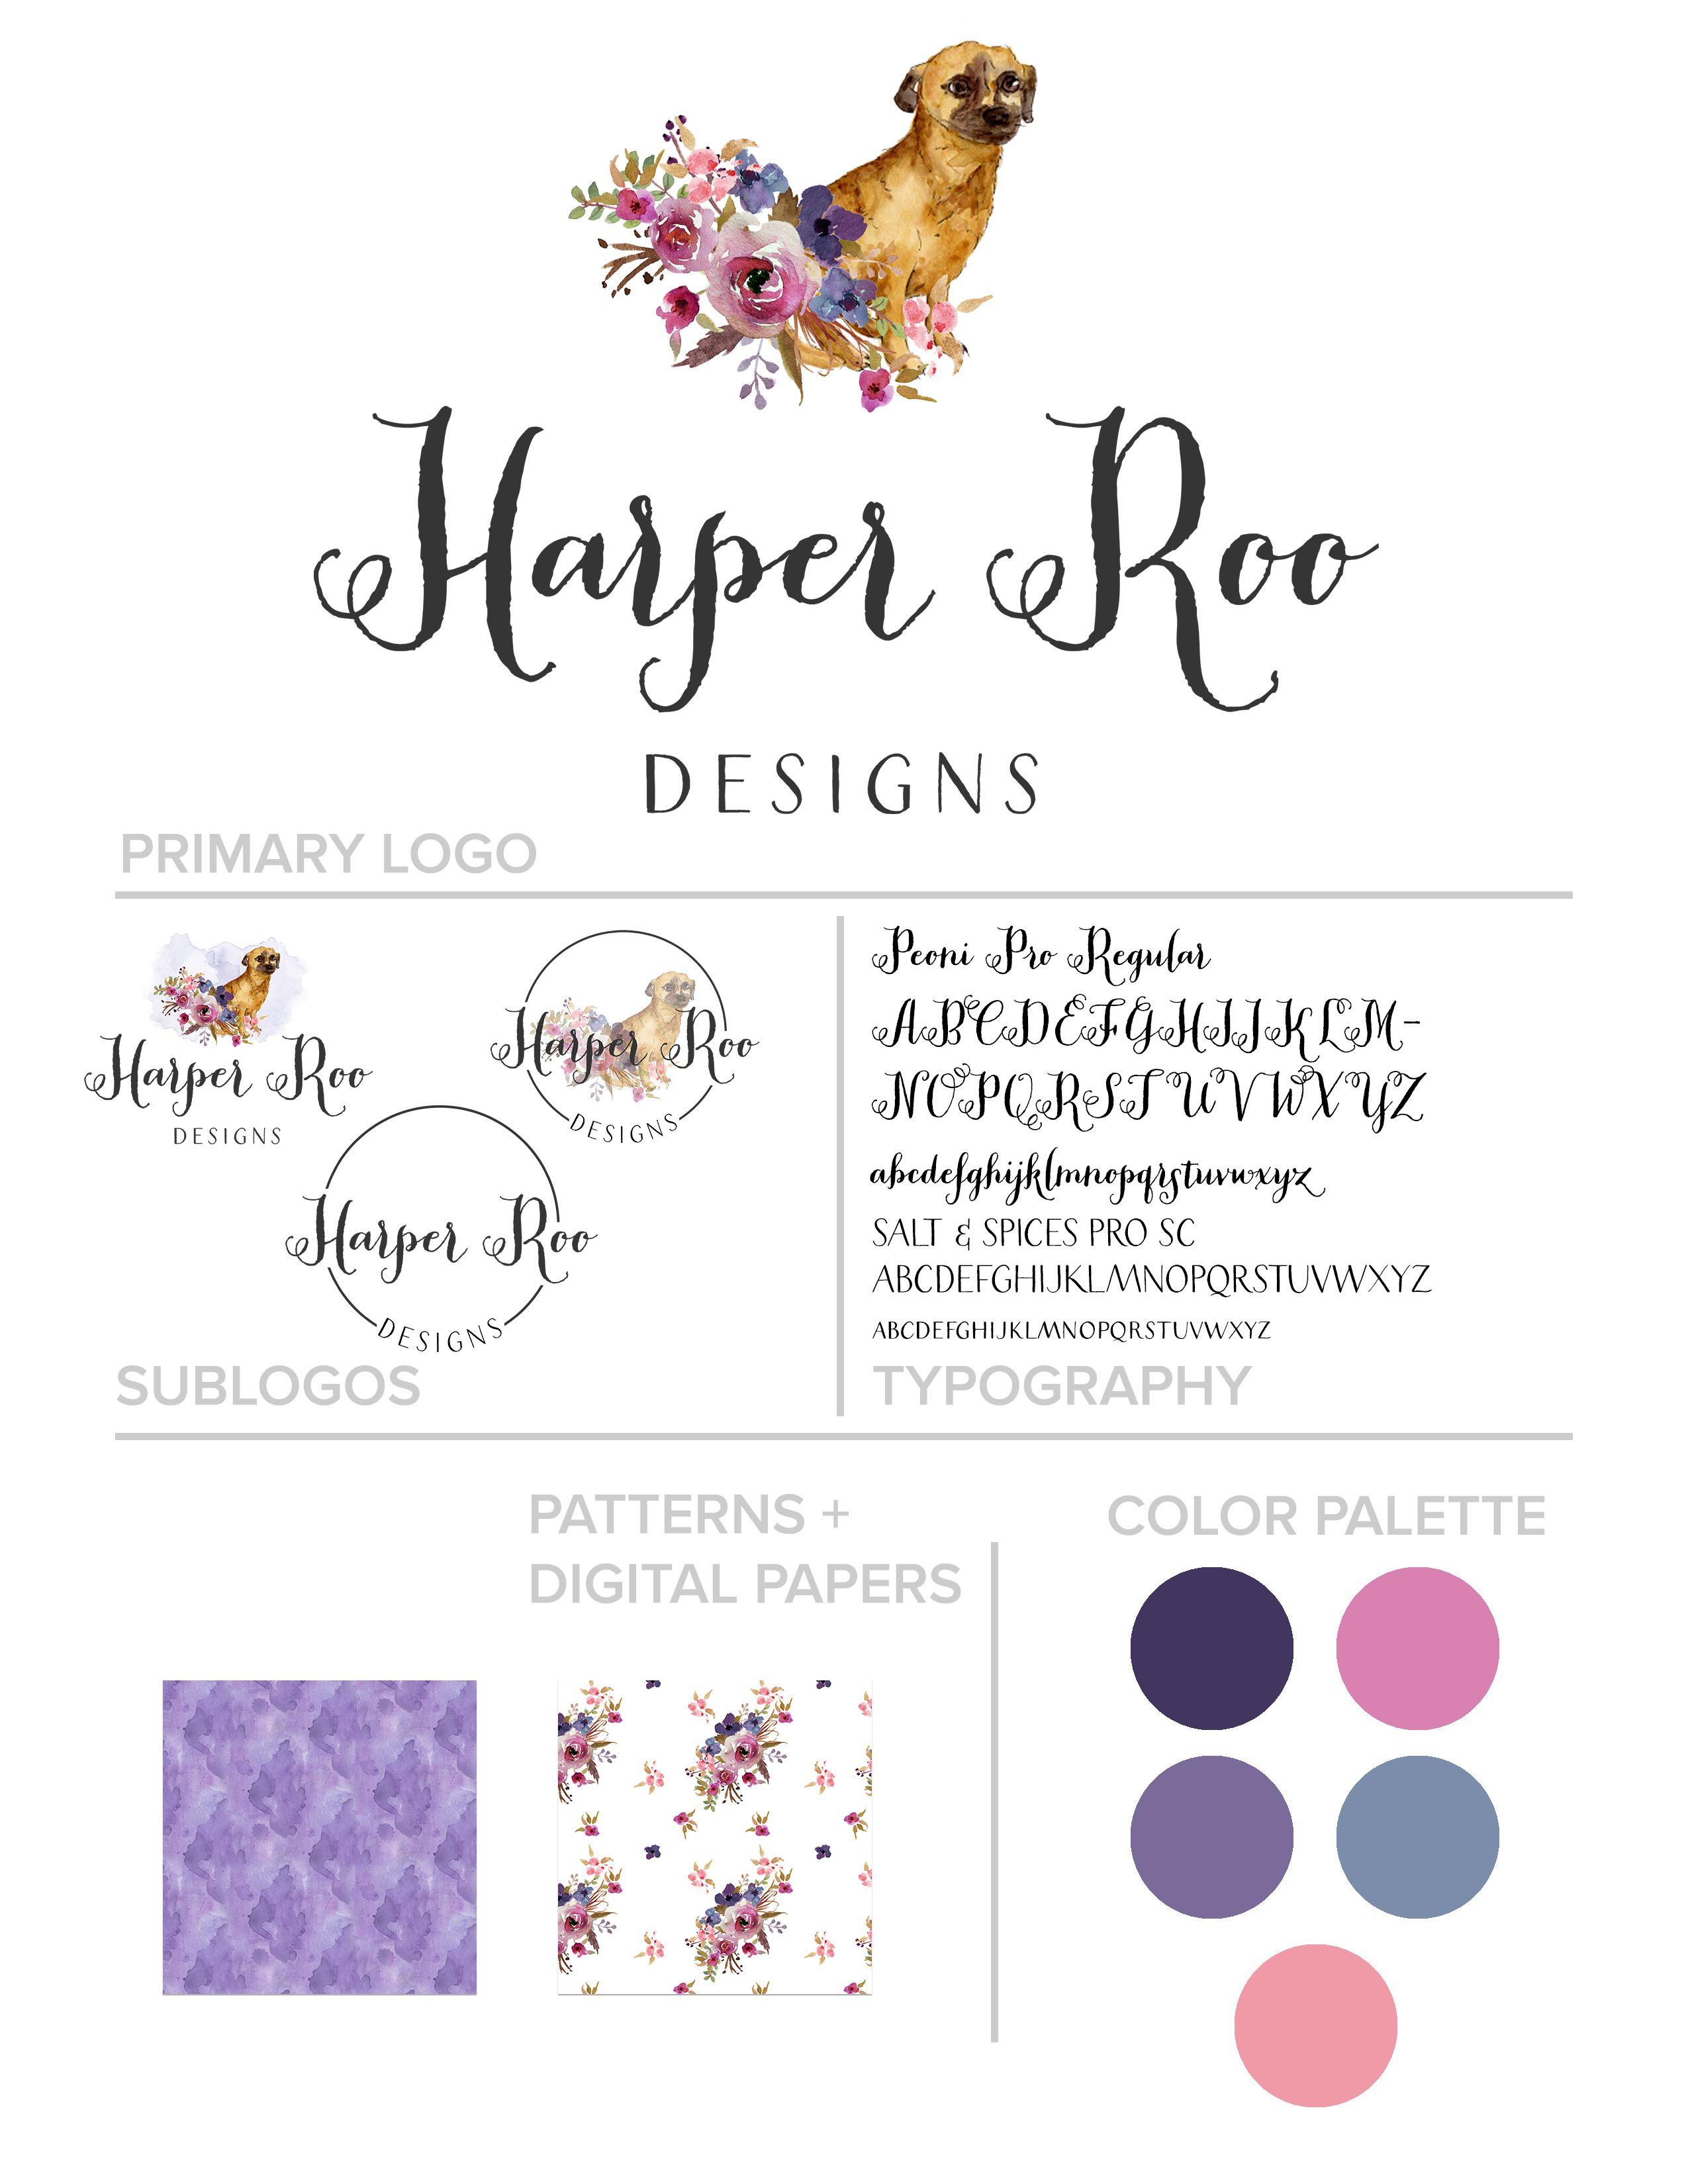 autumn lane paperie business branding brand identity idea